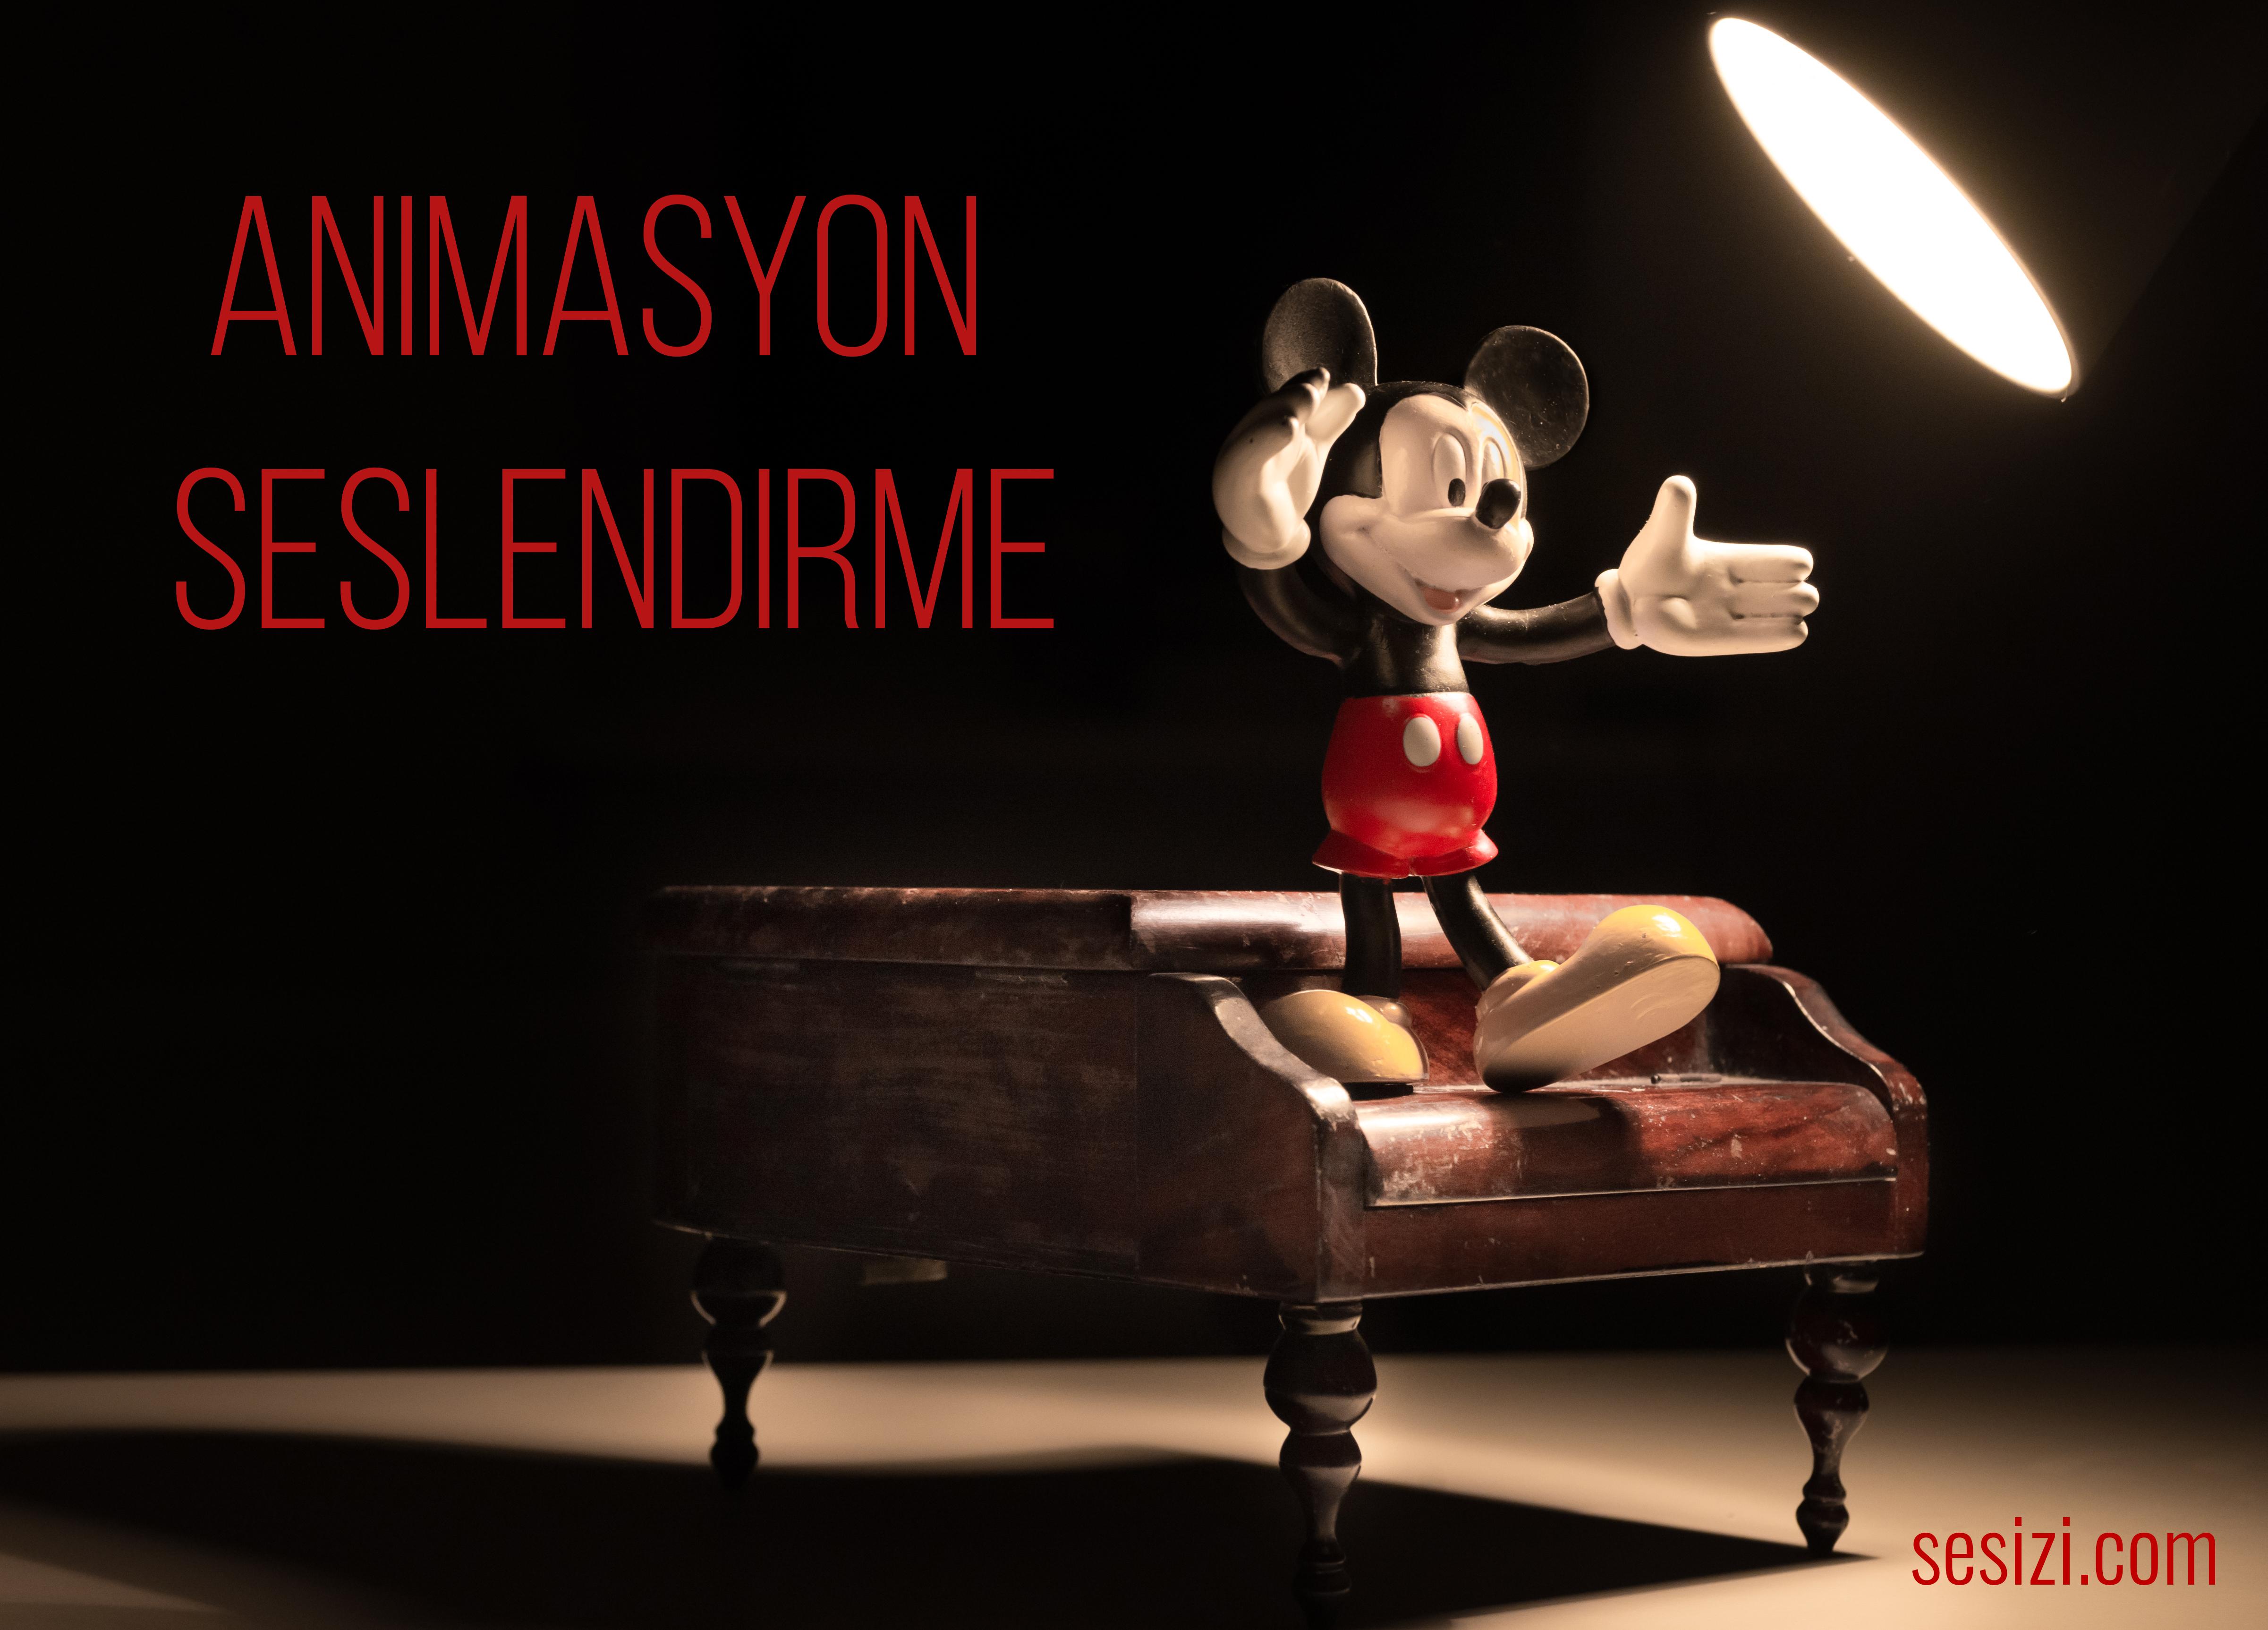 animasyon seslendirme